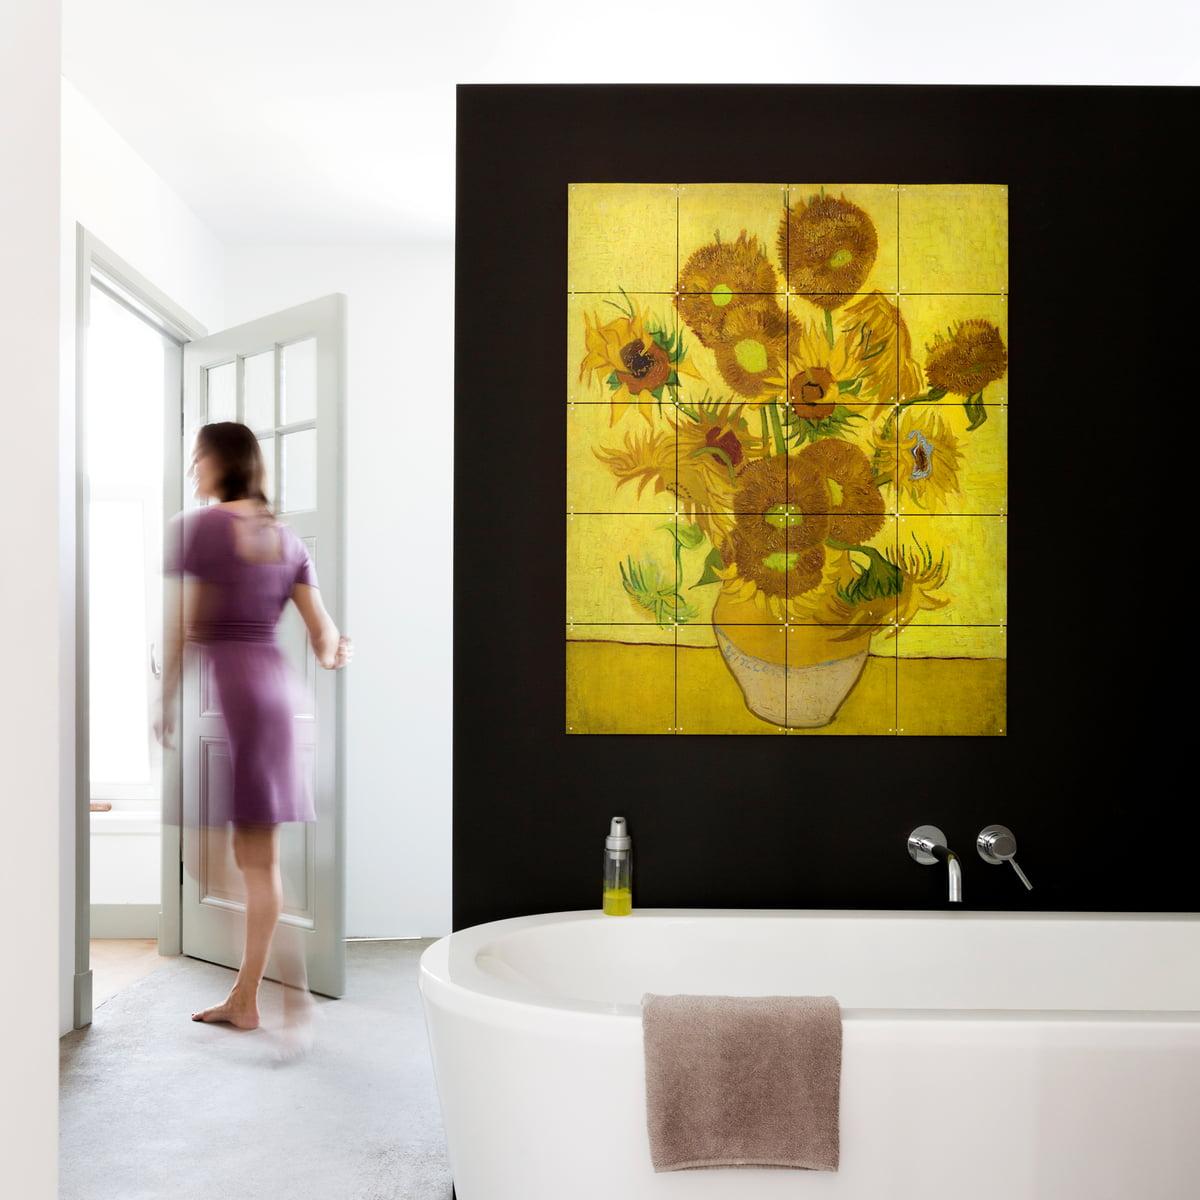 IXXI-Sonnenblumen-Van-Gogh-140-x-180-cm-Ambiente.jpg